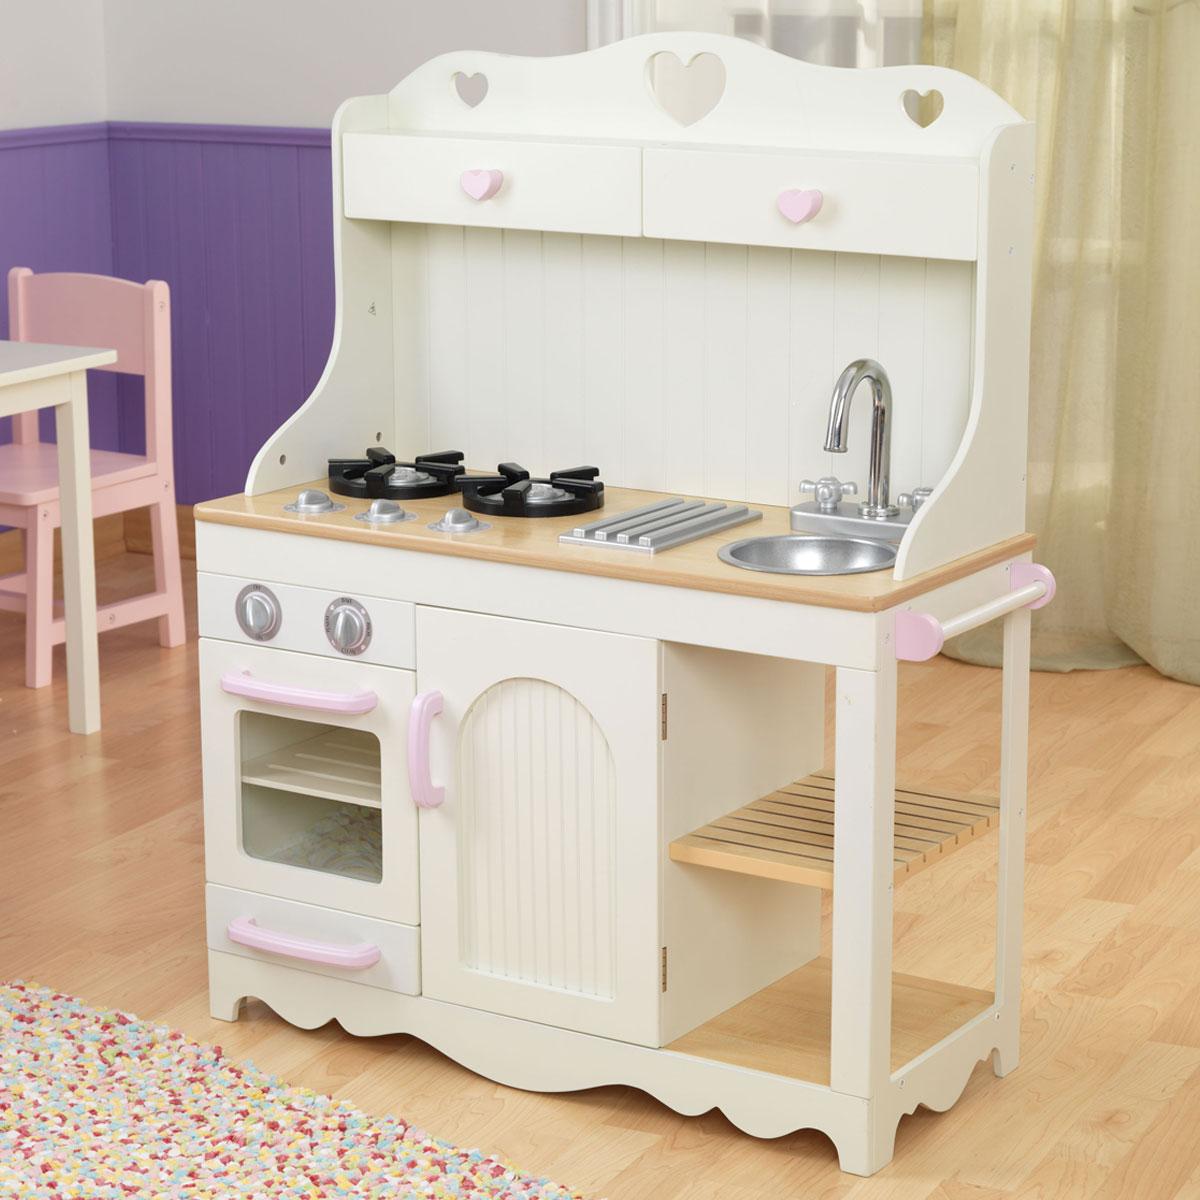 KidKraft Kinderküche Prärie aus Holz 53151